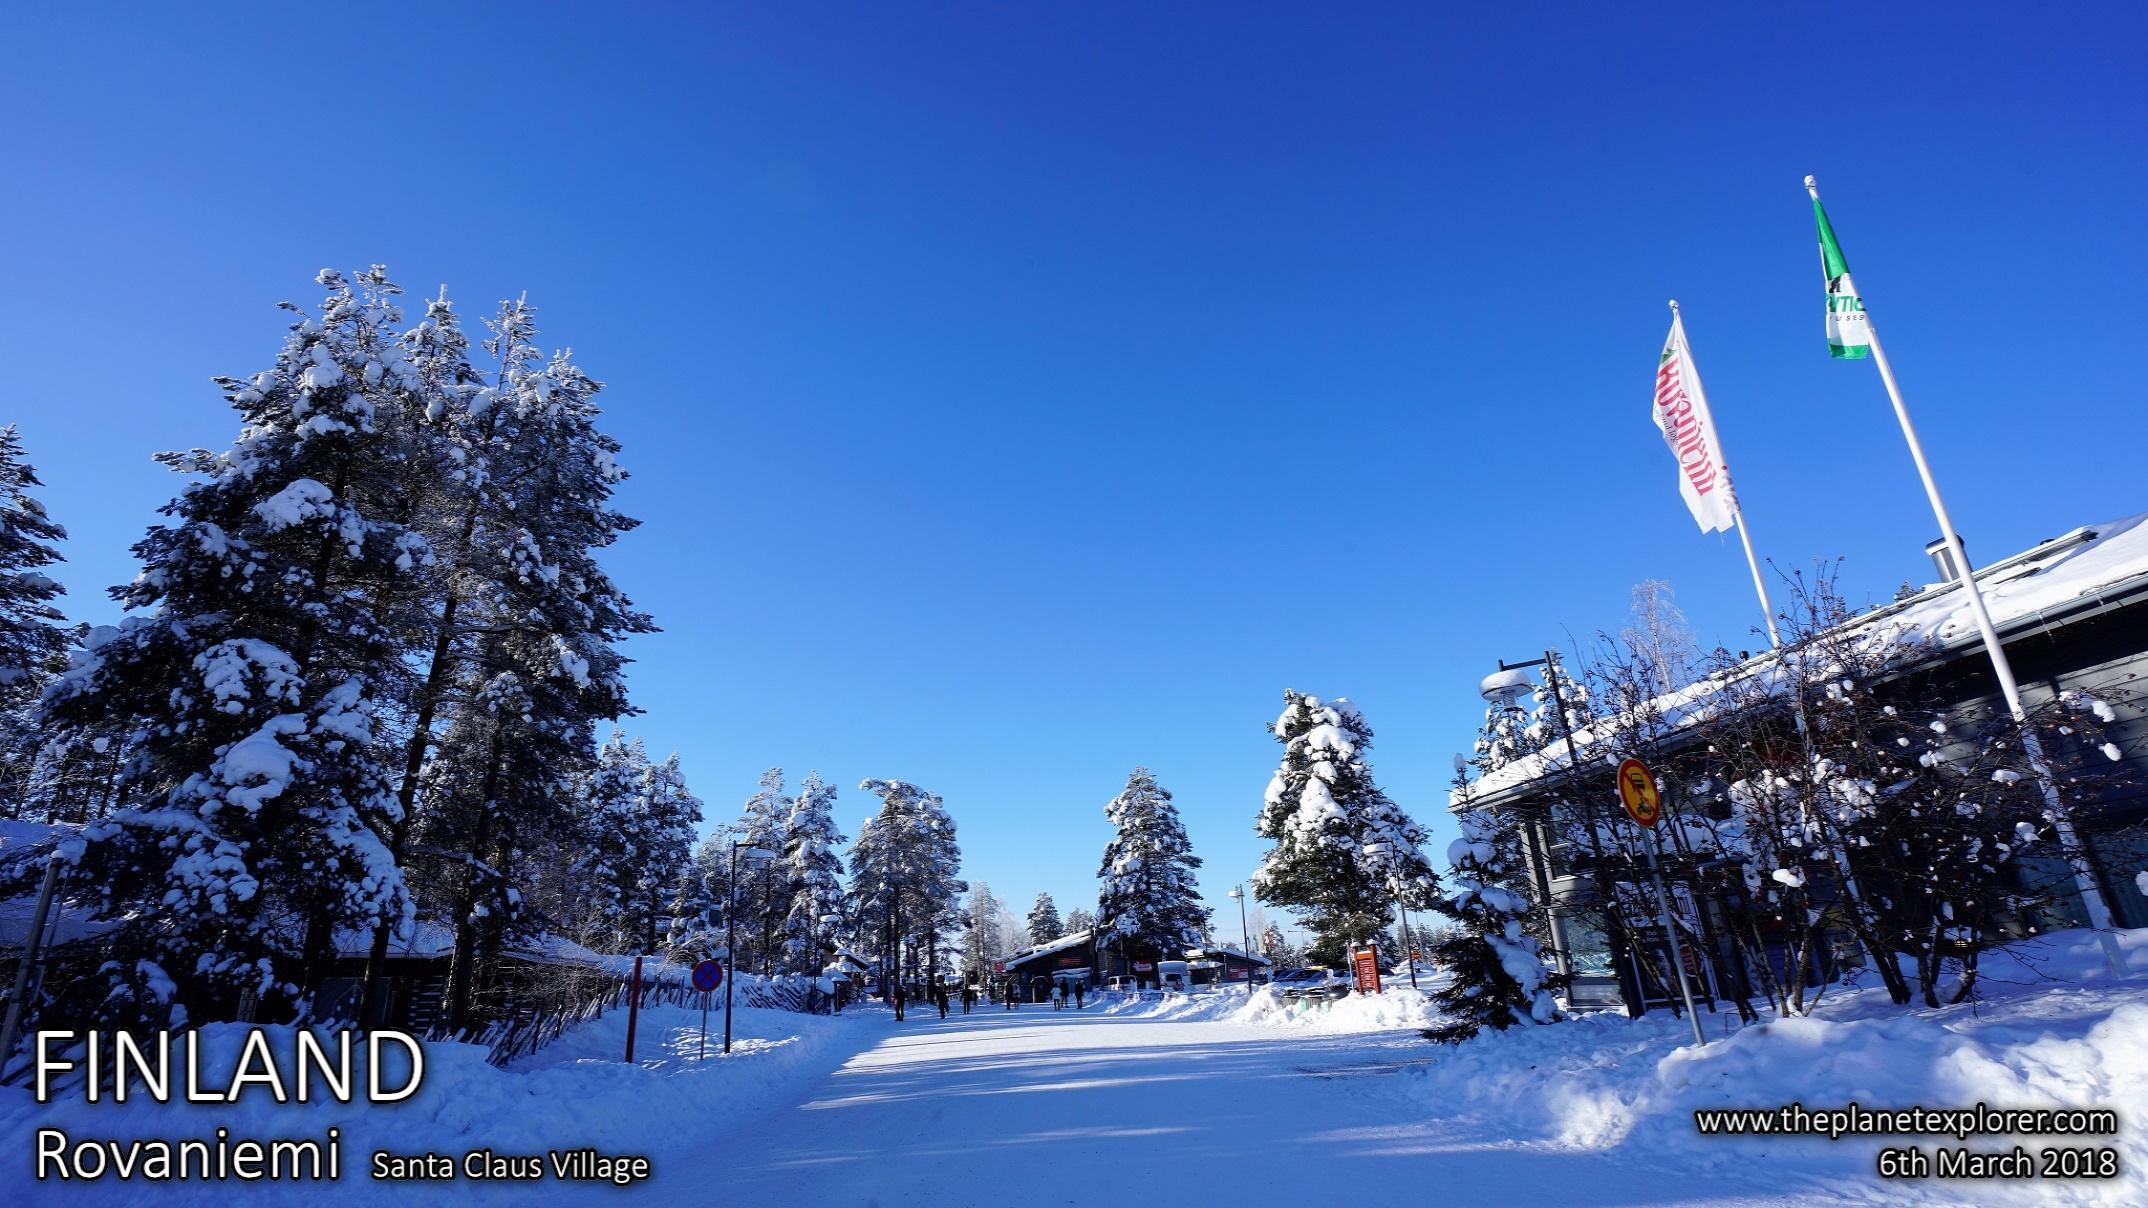 20180306_1152_Finland_Rovaniemi_Santa Claus Village_DSC09724_Sony a7R2_LR_@www